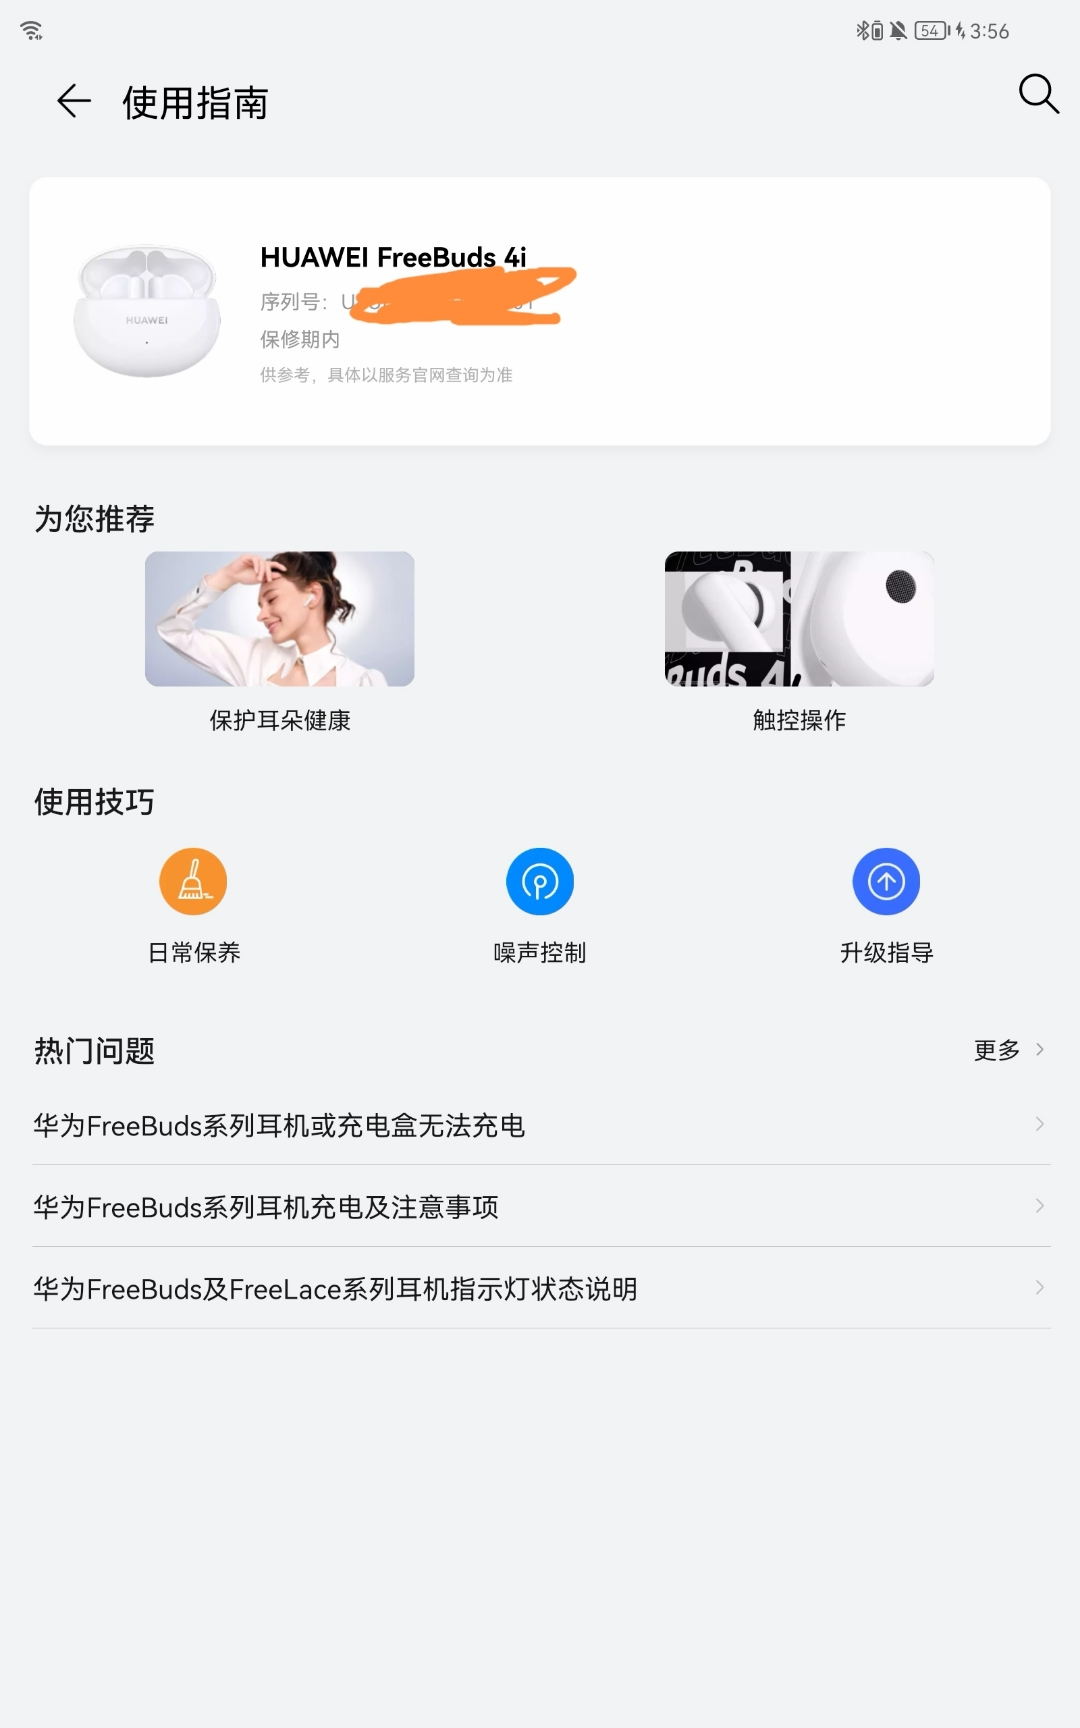 Screenshot_20210917_155641_com.huawei.smarthome_edit_333566658662120.jpg